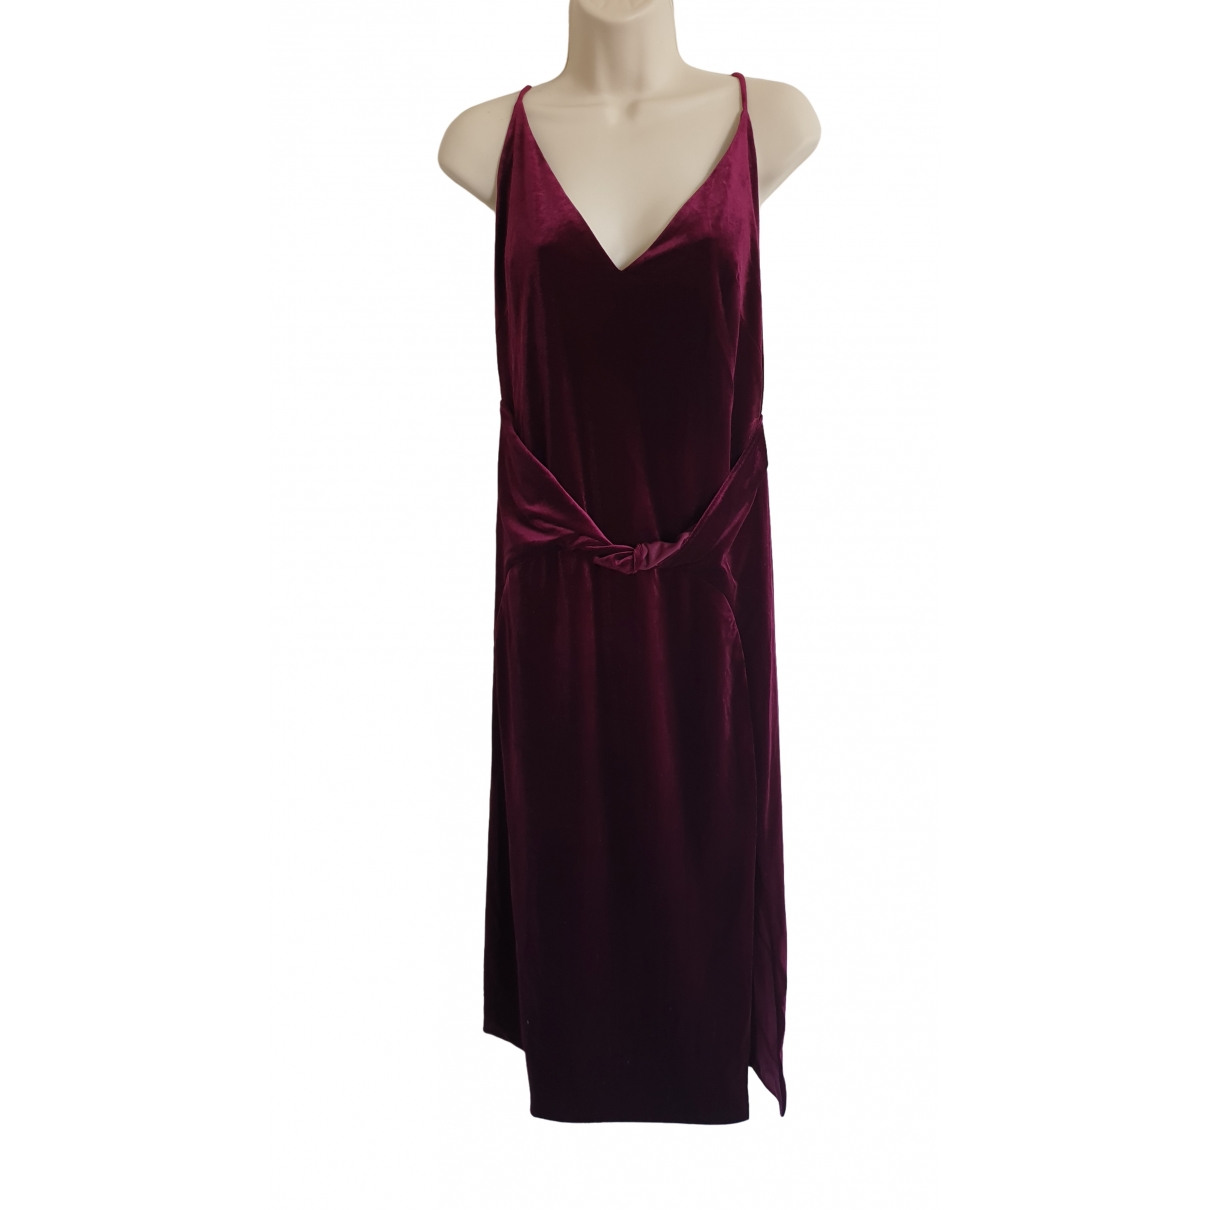 Catherine Malandrino \N Kleid in  Bordeauxrot Samt